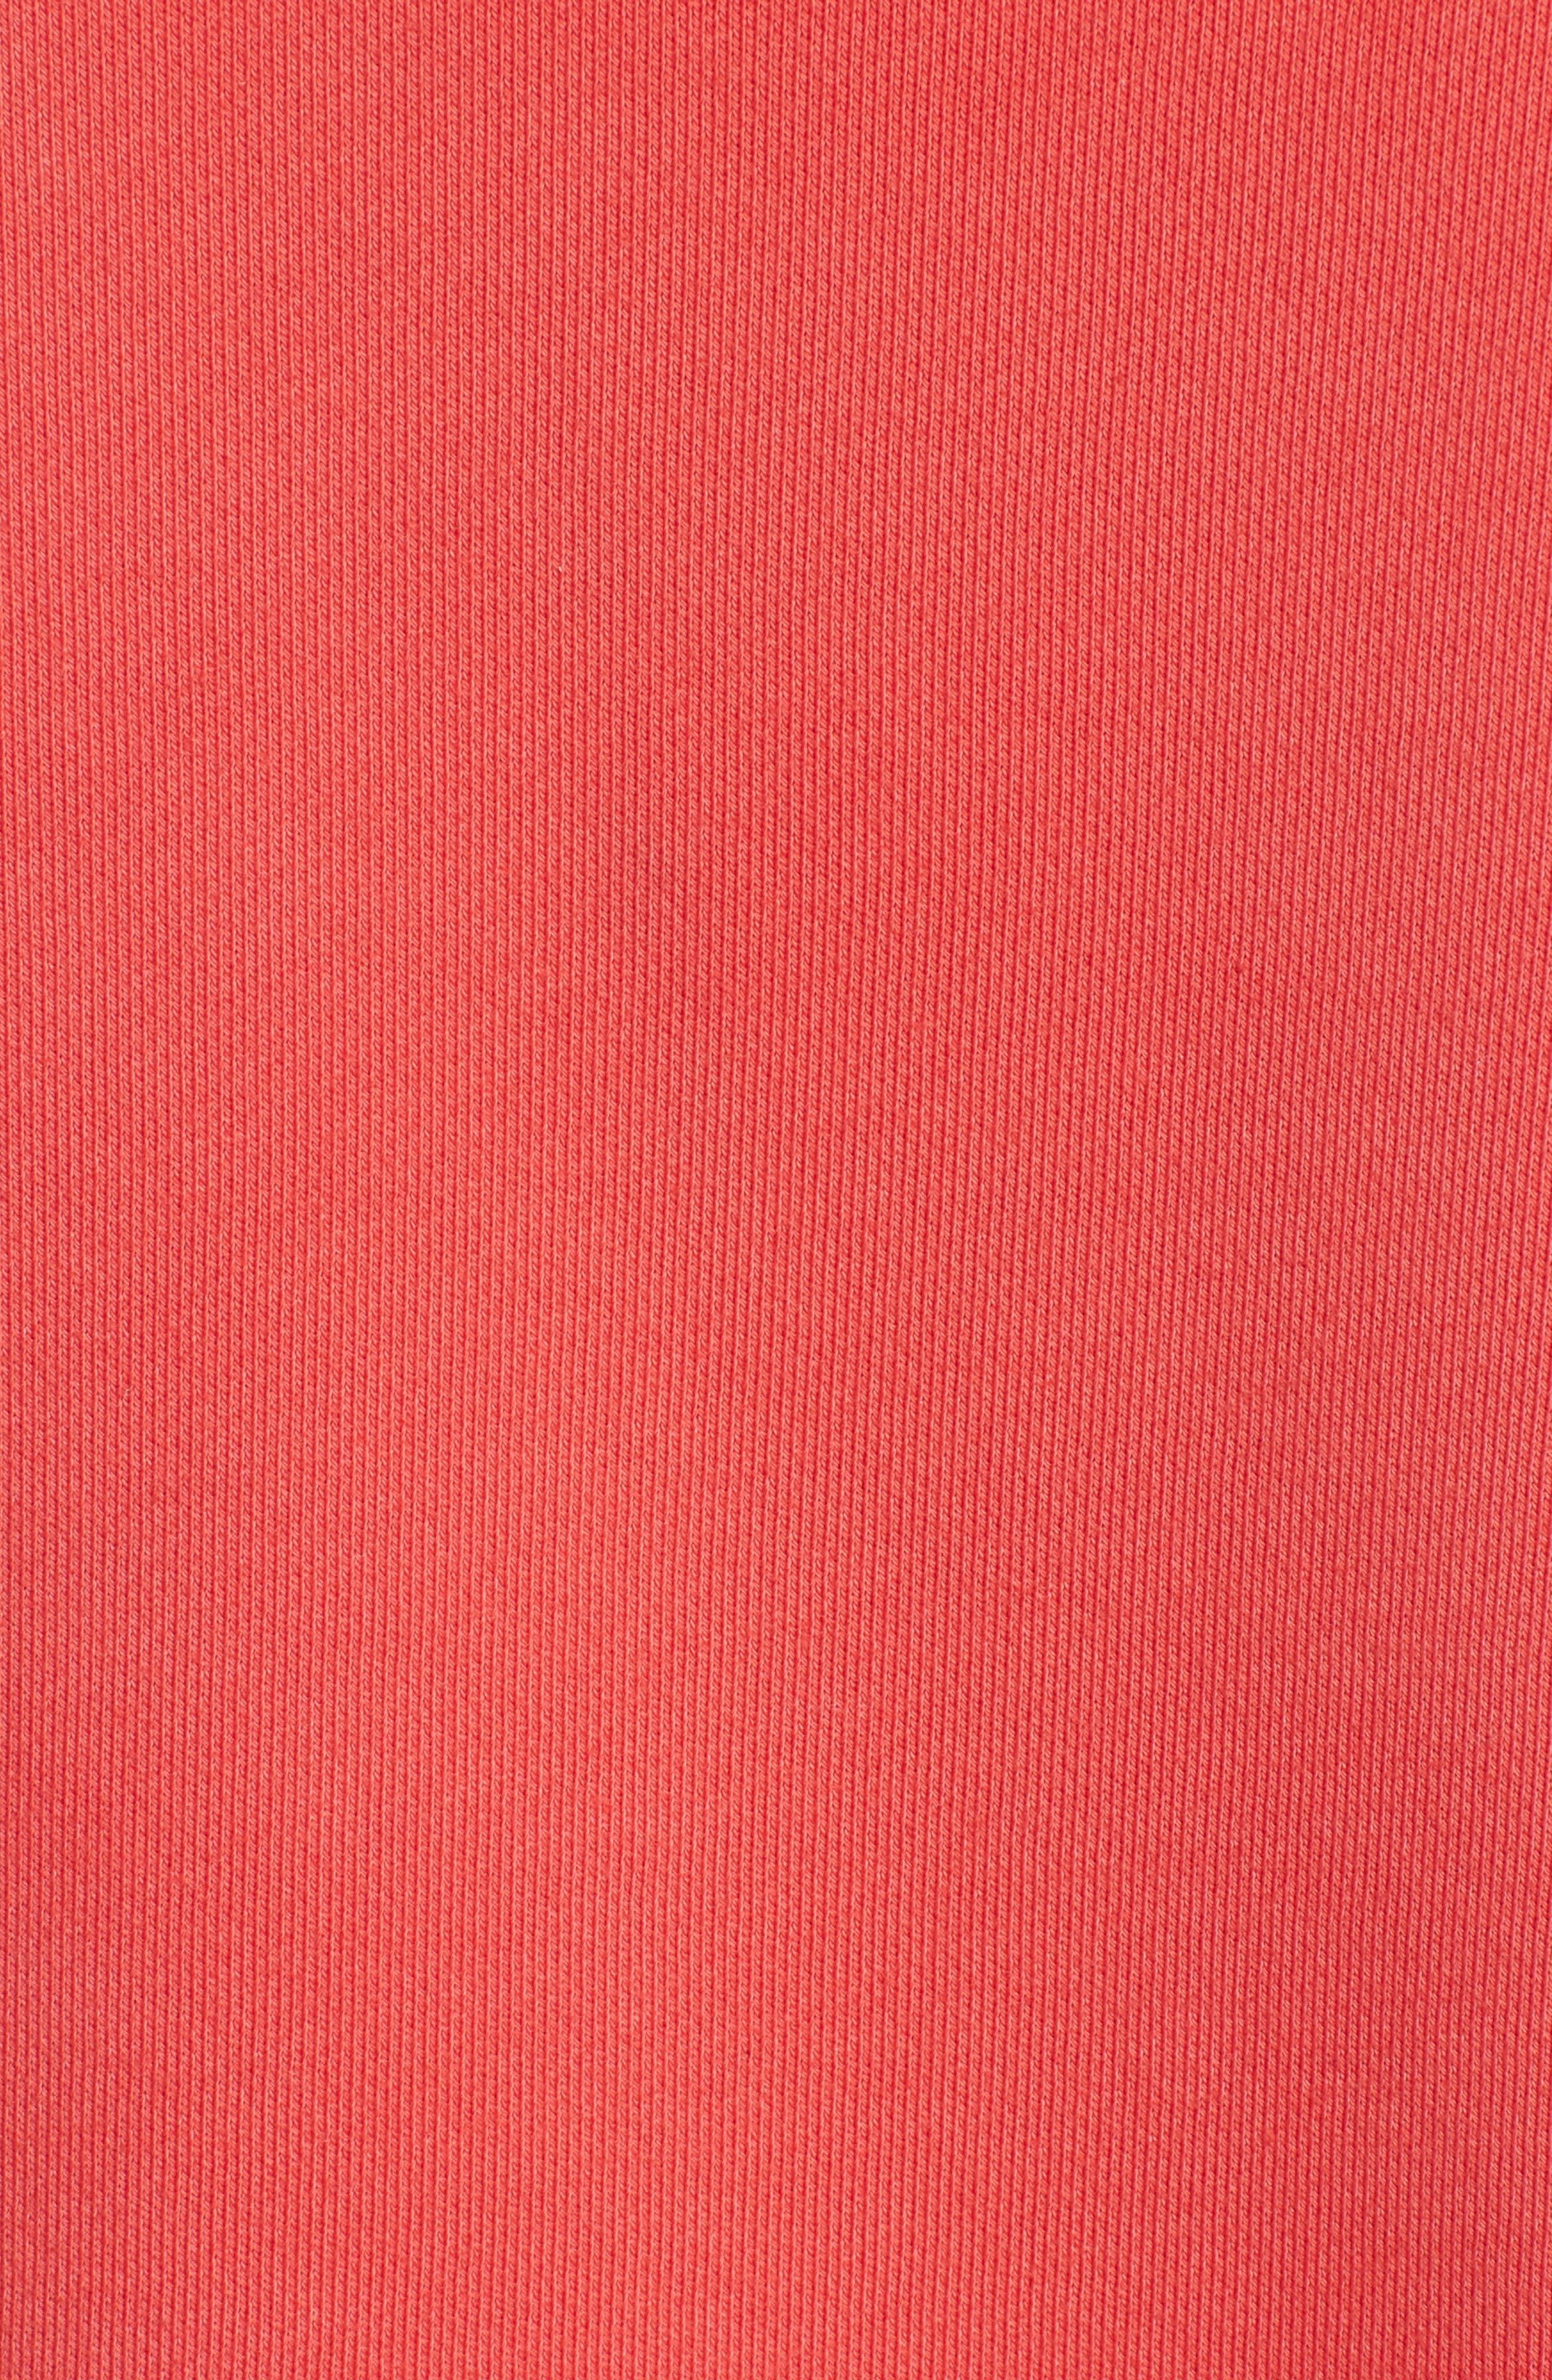 Mickey Shrunken Sweatshirt,                             Alternate thumbnail 6, color,                             600